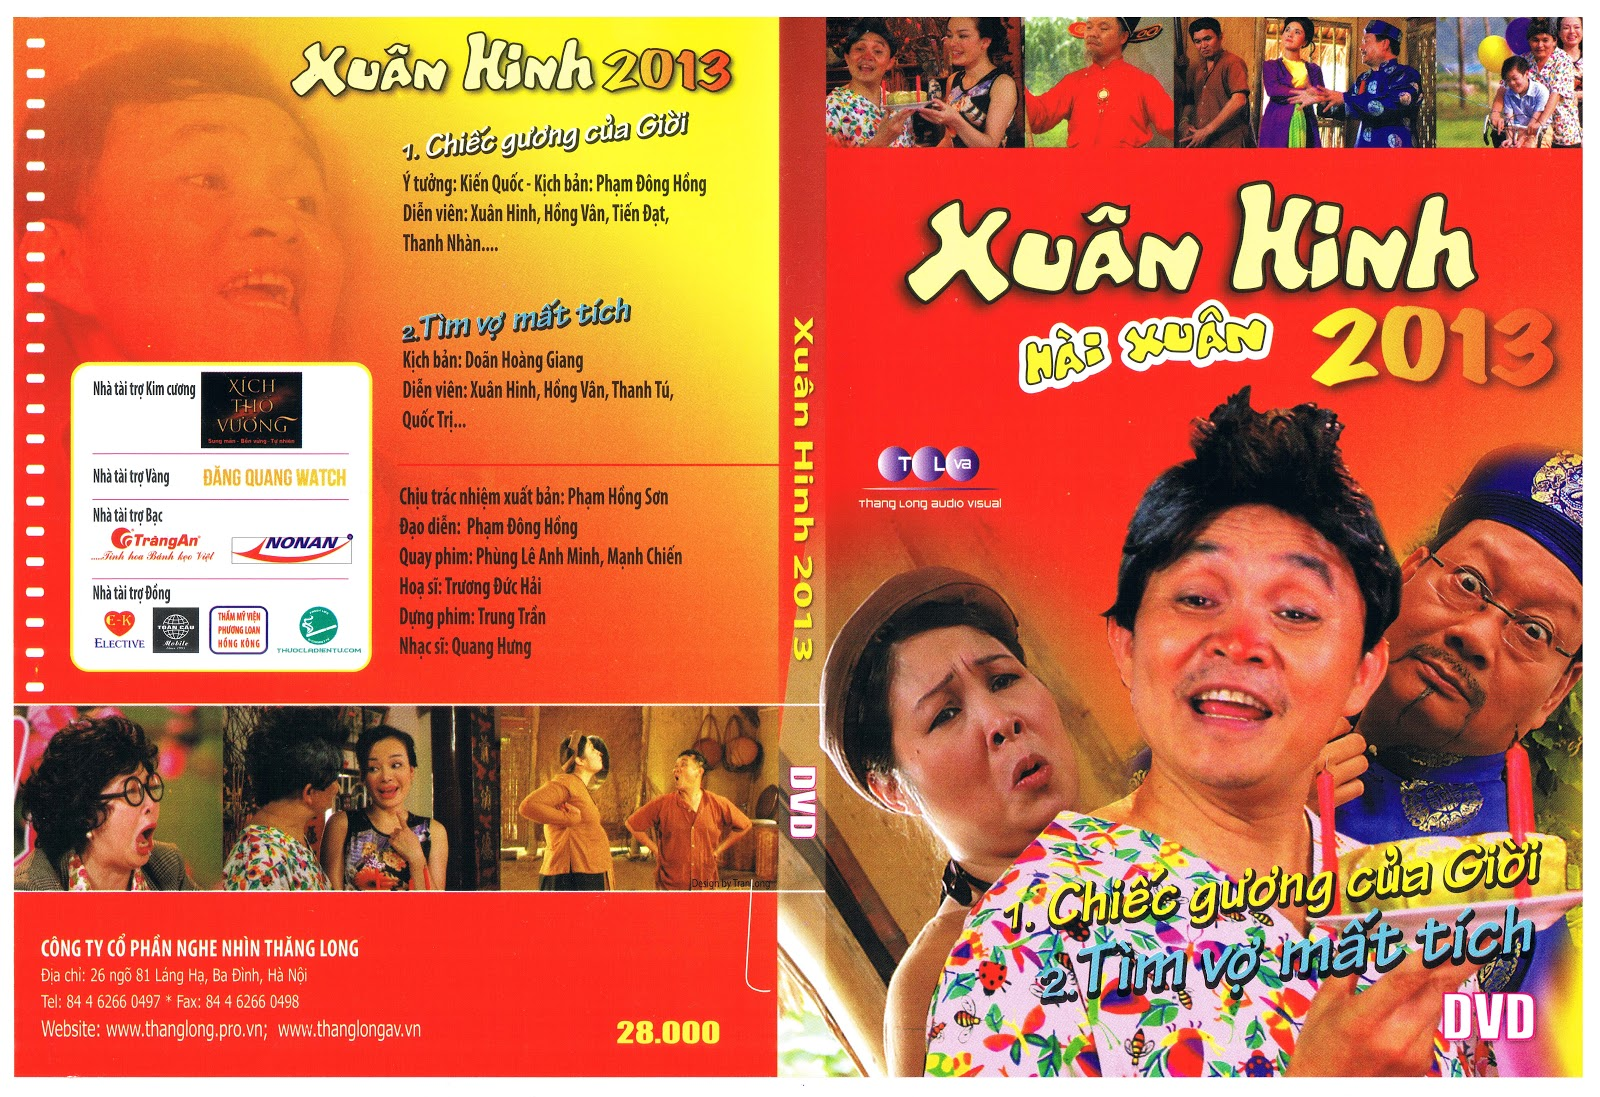 Hài Tết Xuân Hinh 2013 - Hài Tết Xuân Hinh 2013 -